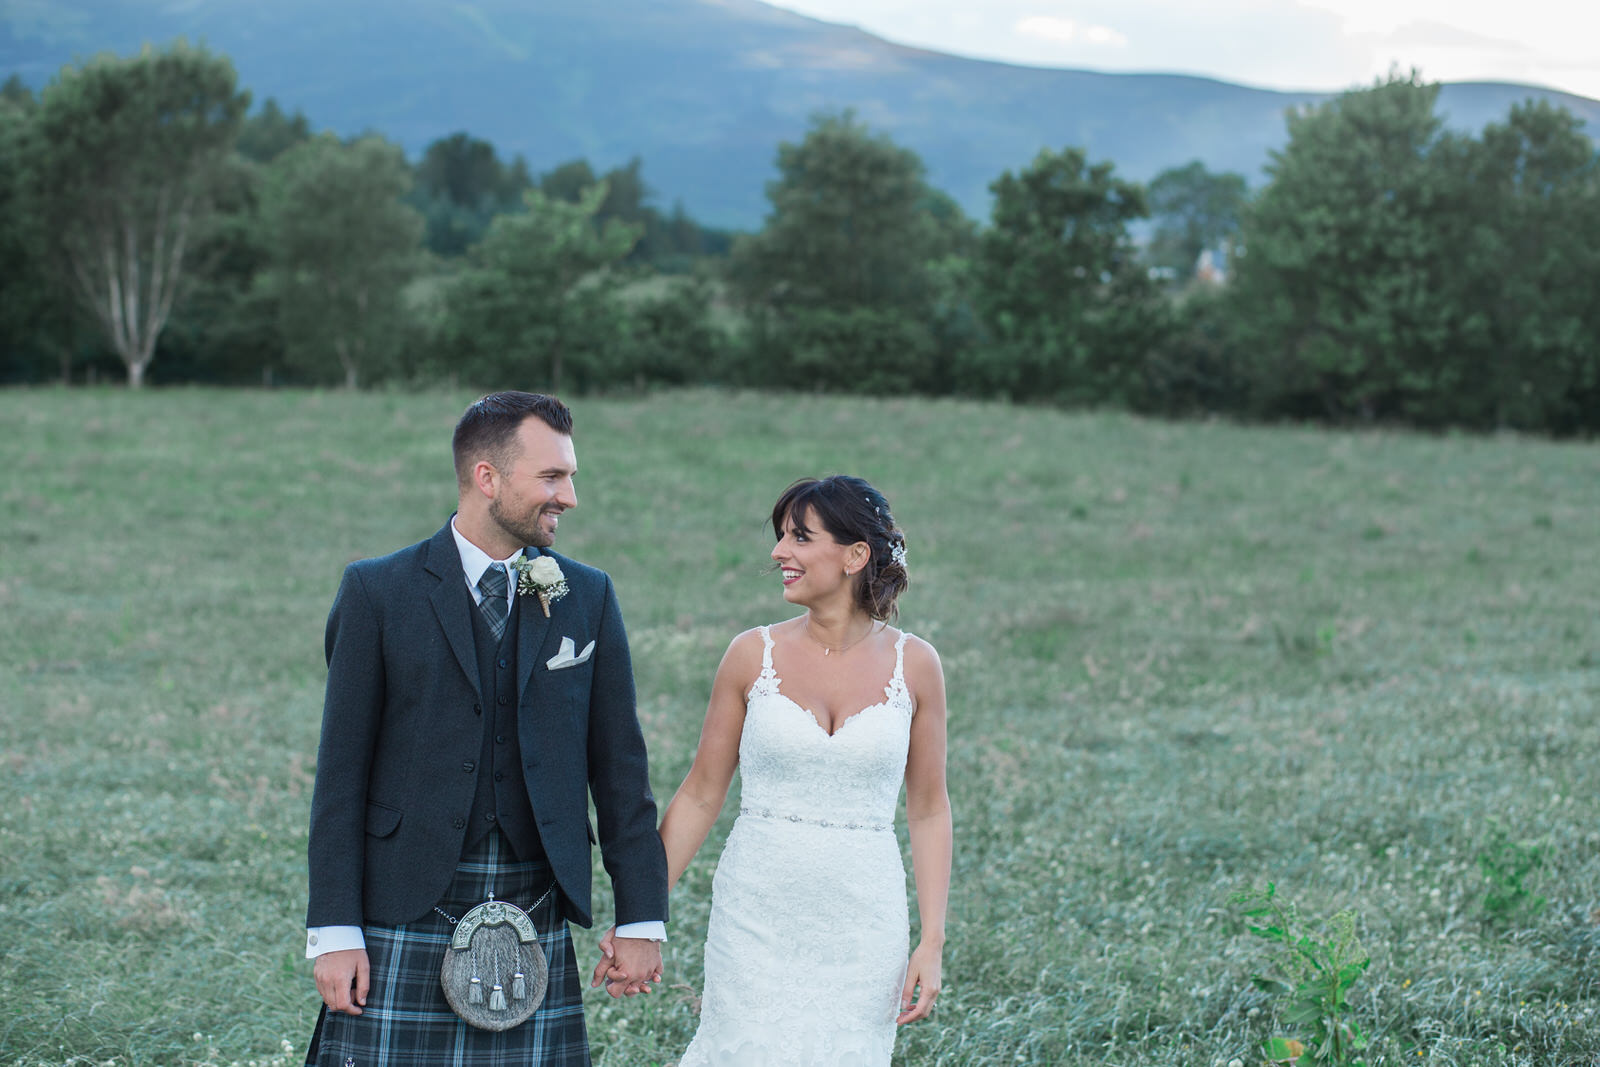 Glasgow wedding photographer, Edinburgh wedding photographer, aberdeen wedding photography, aberdeen wedding photographer, outdoor wedding Scotland, Scottish outdoor wedding, Vivienne Elizabeth photography